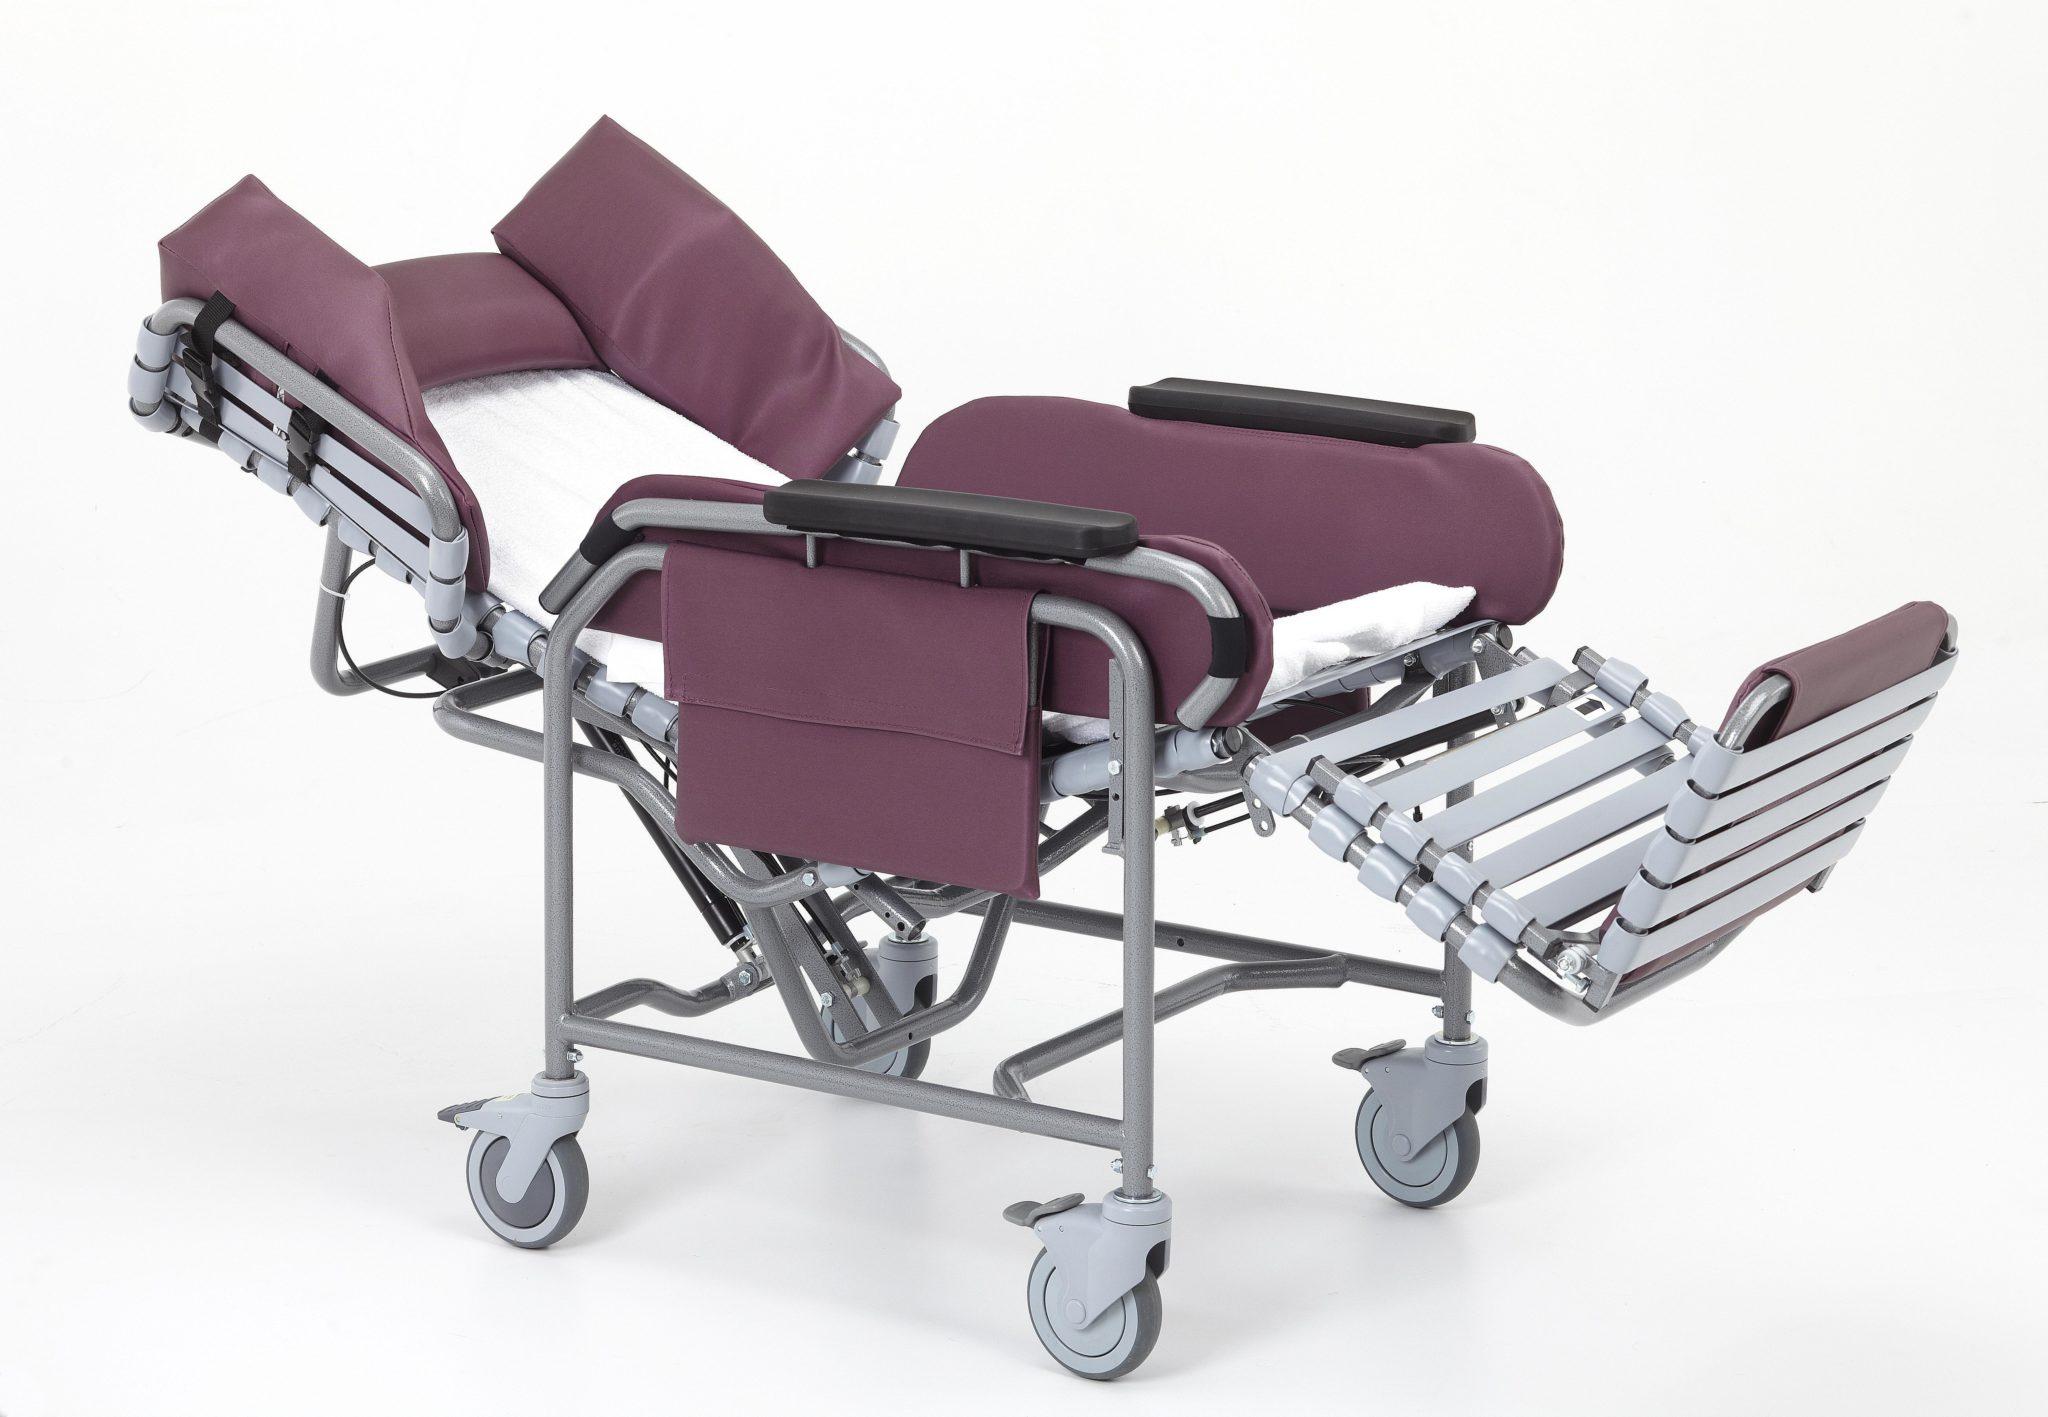 broda chair high chairs 30vt in minneapolis mn corner home medical